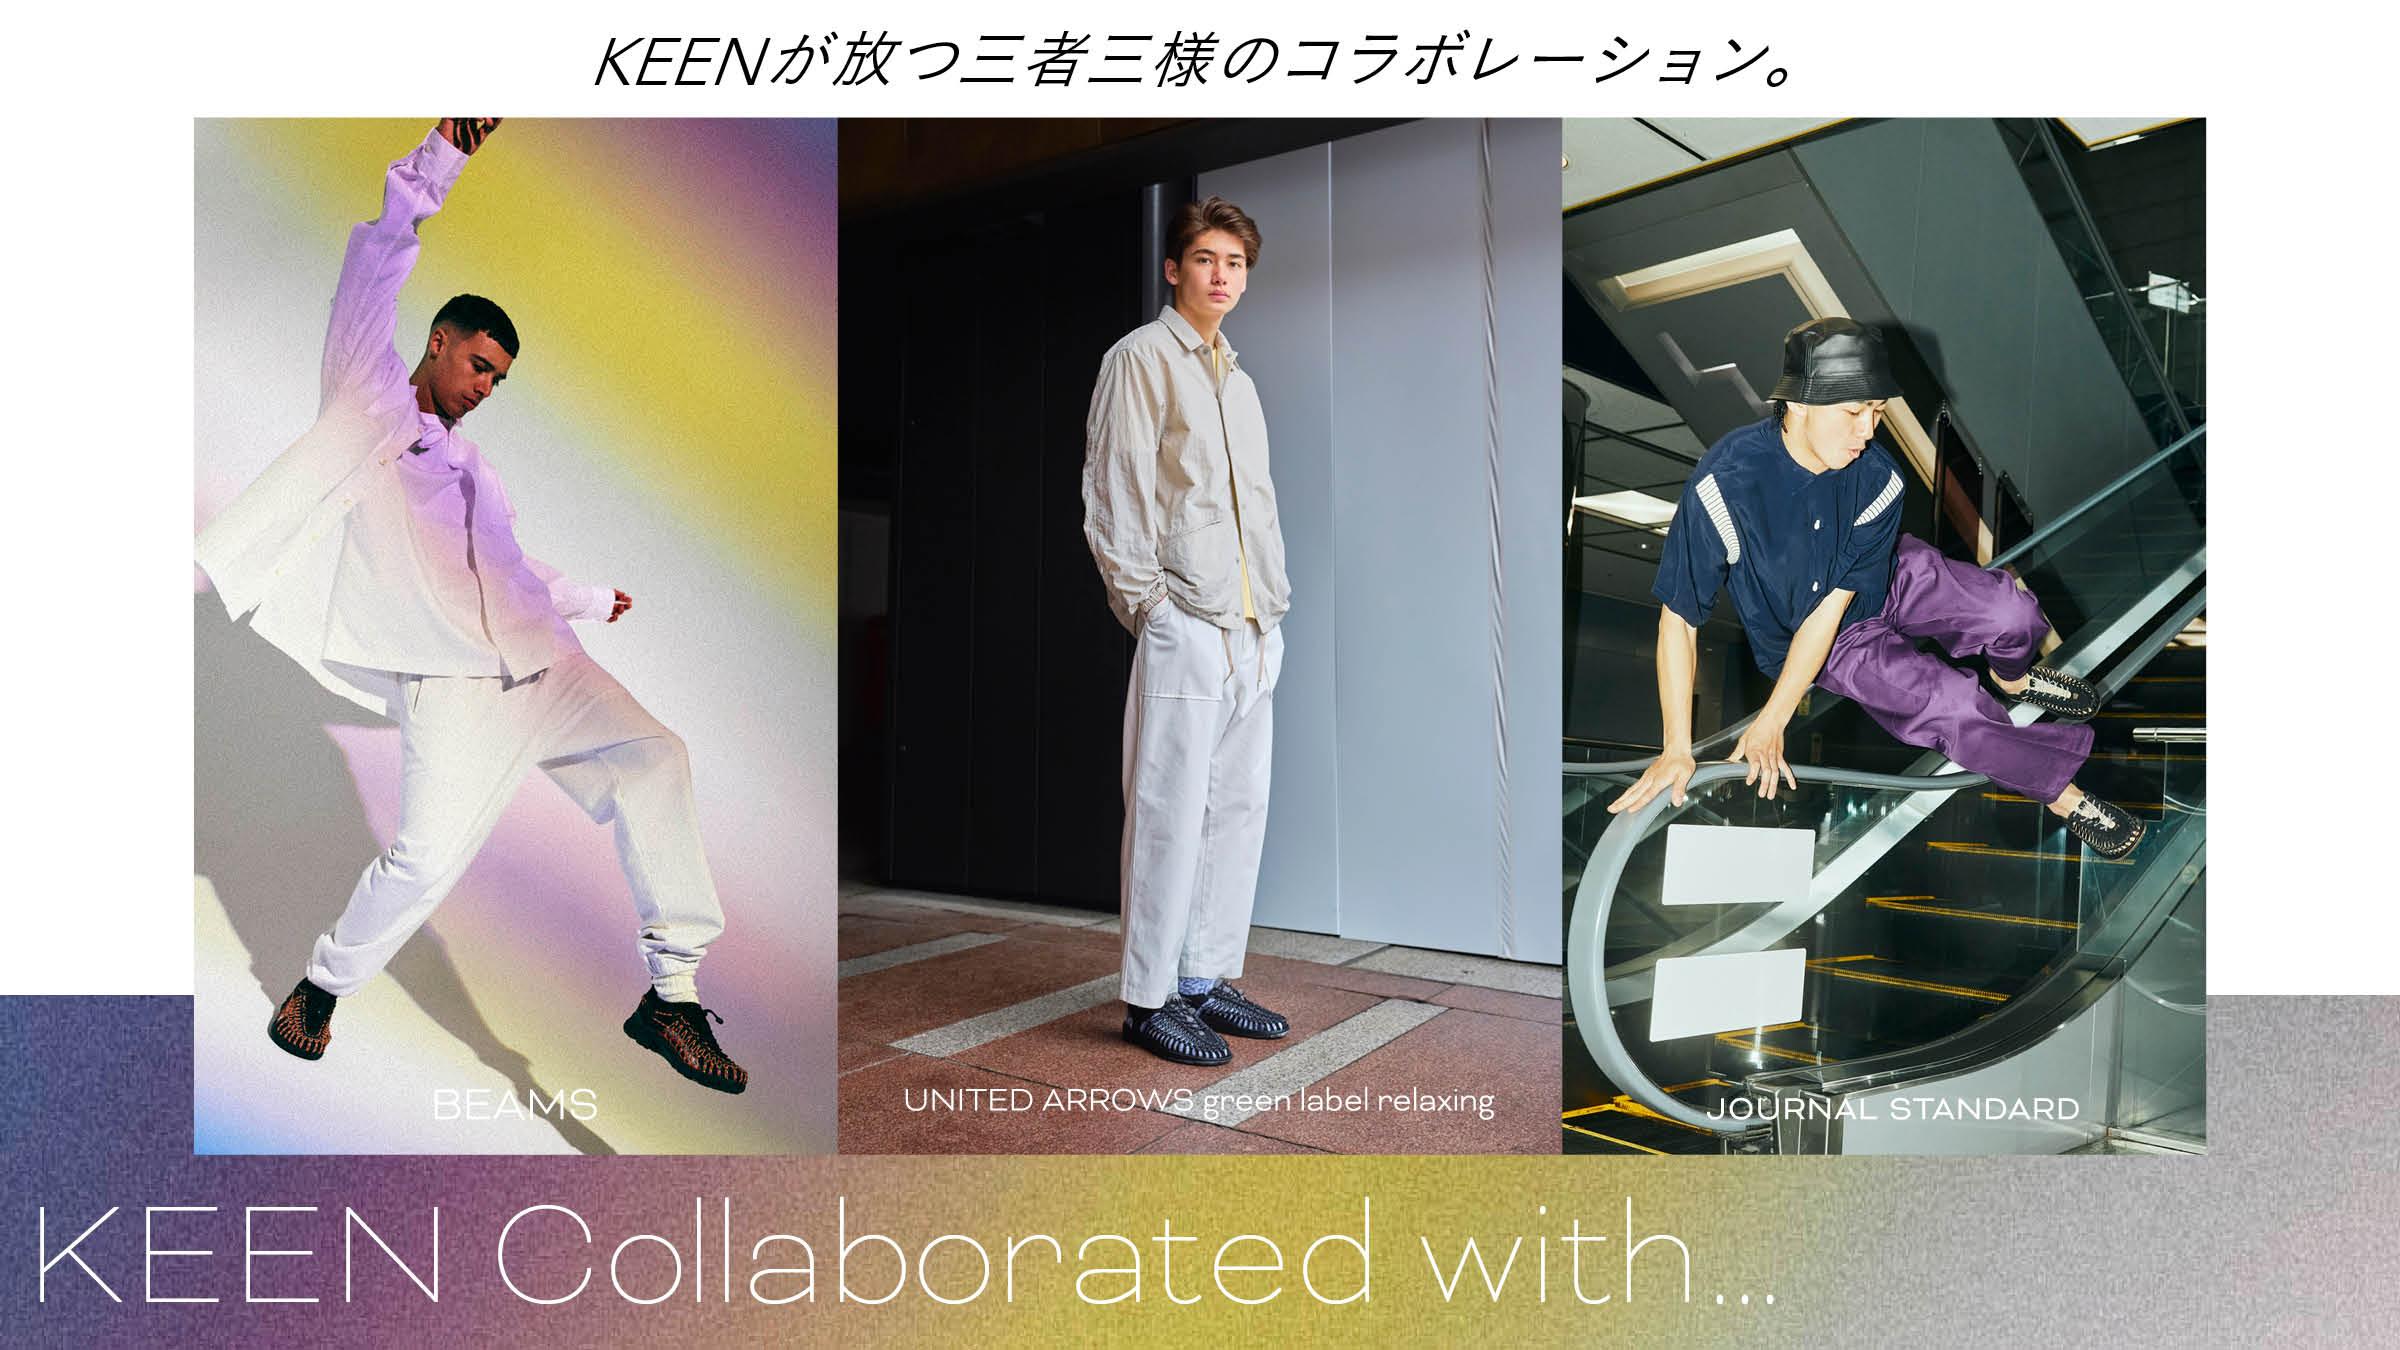 KEENが放つ三者三様のコラボレーション。